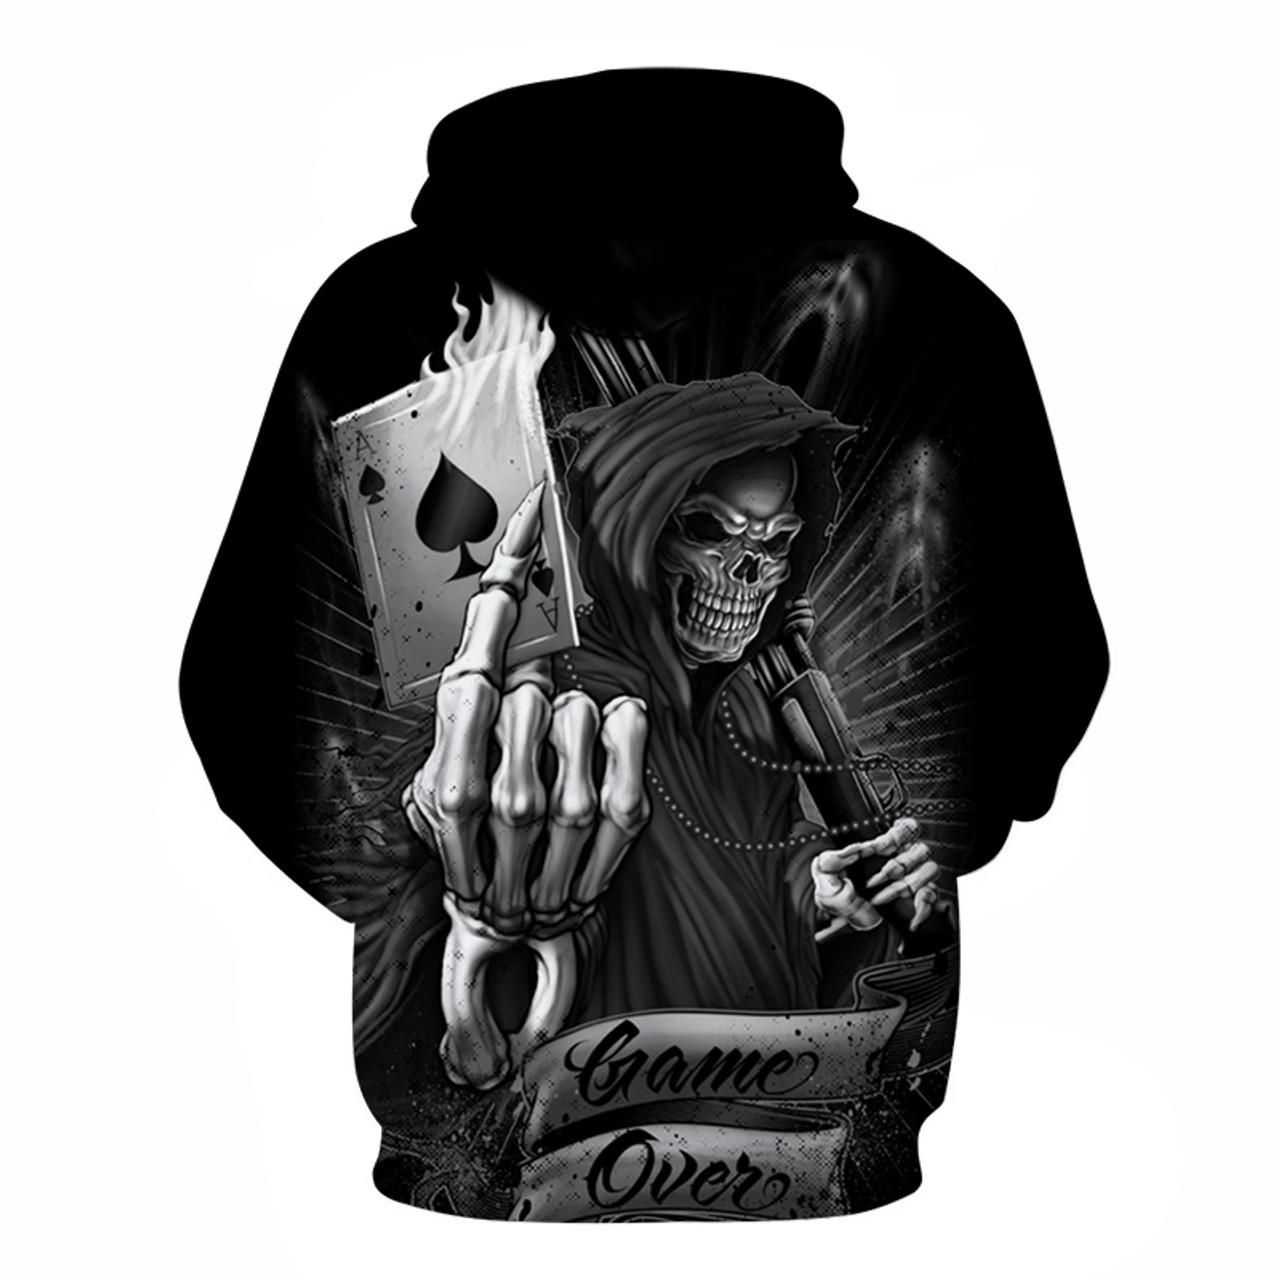 3D Sweatshirts Hoody Funny Hoodies Loose Tracksuit Autumn Hooded Coat